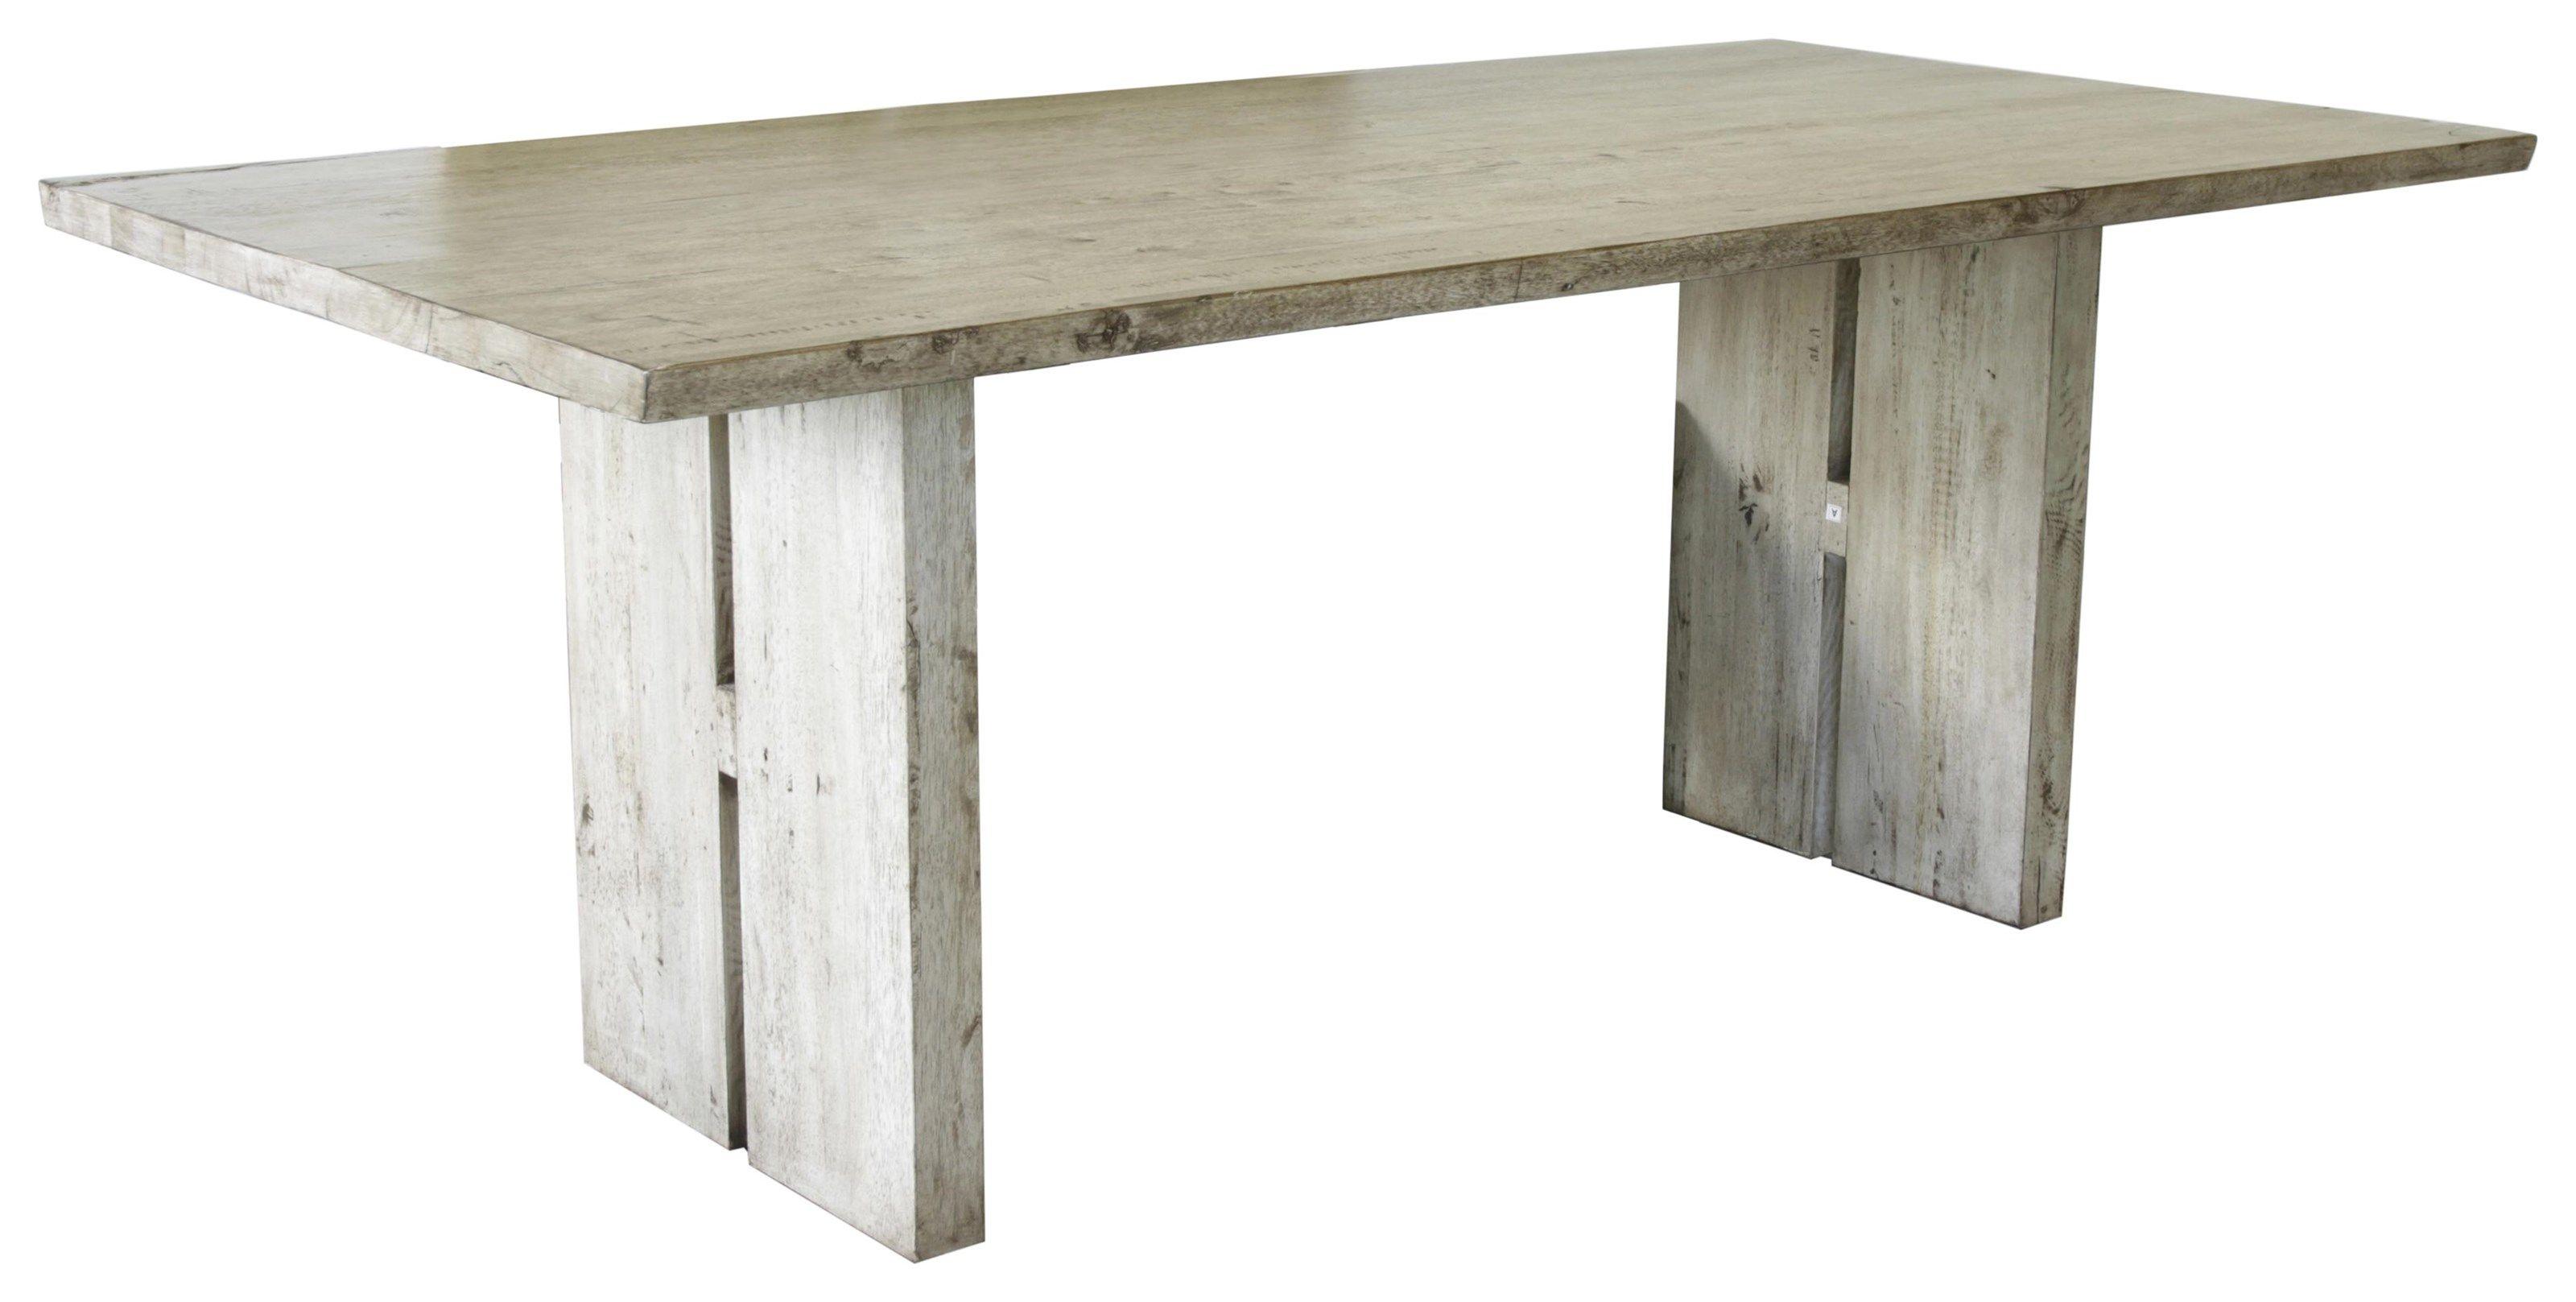 Renewal Dining Table By Napa Furniture Designs At HomeWorld Furniture